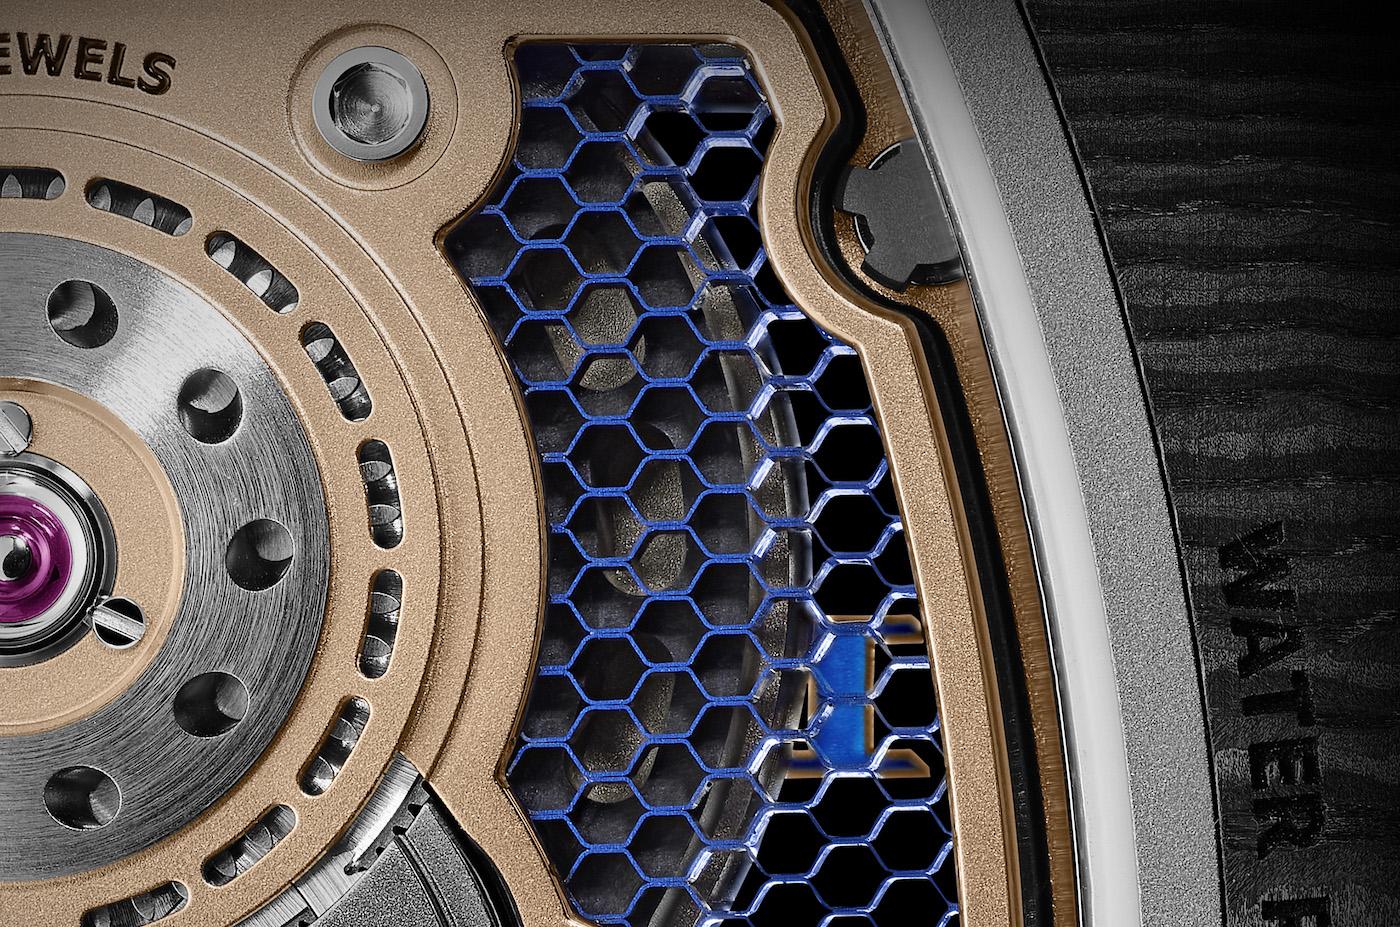 Richard Mille introduces the RM 21-01 Tourbillon Aerodyne